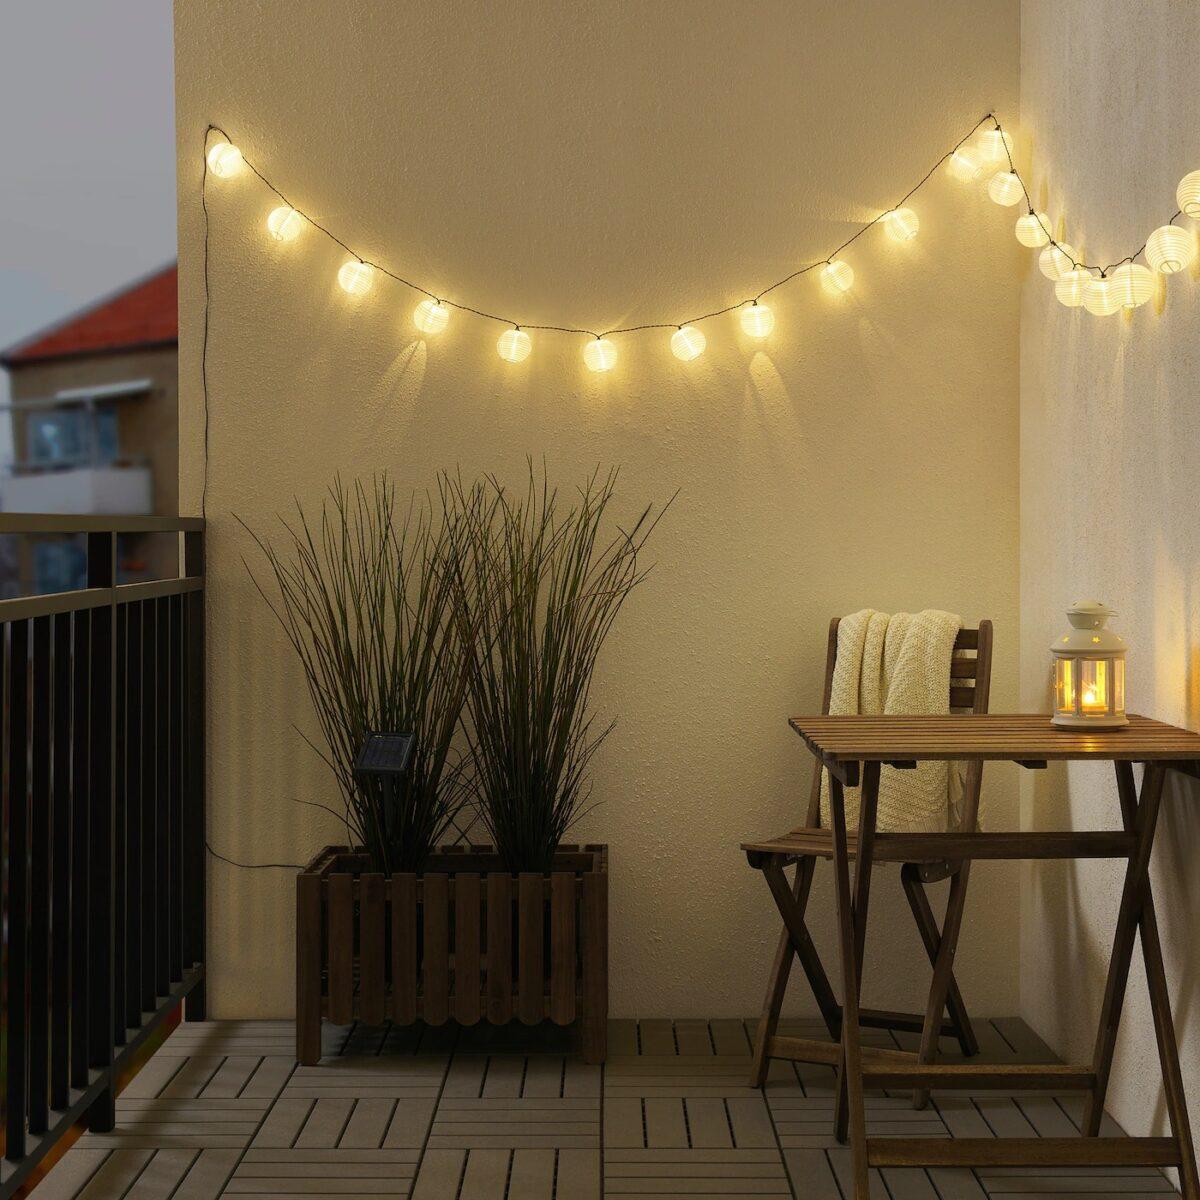 solarvet-illuminazione-a-led-24